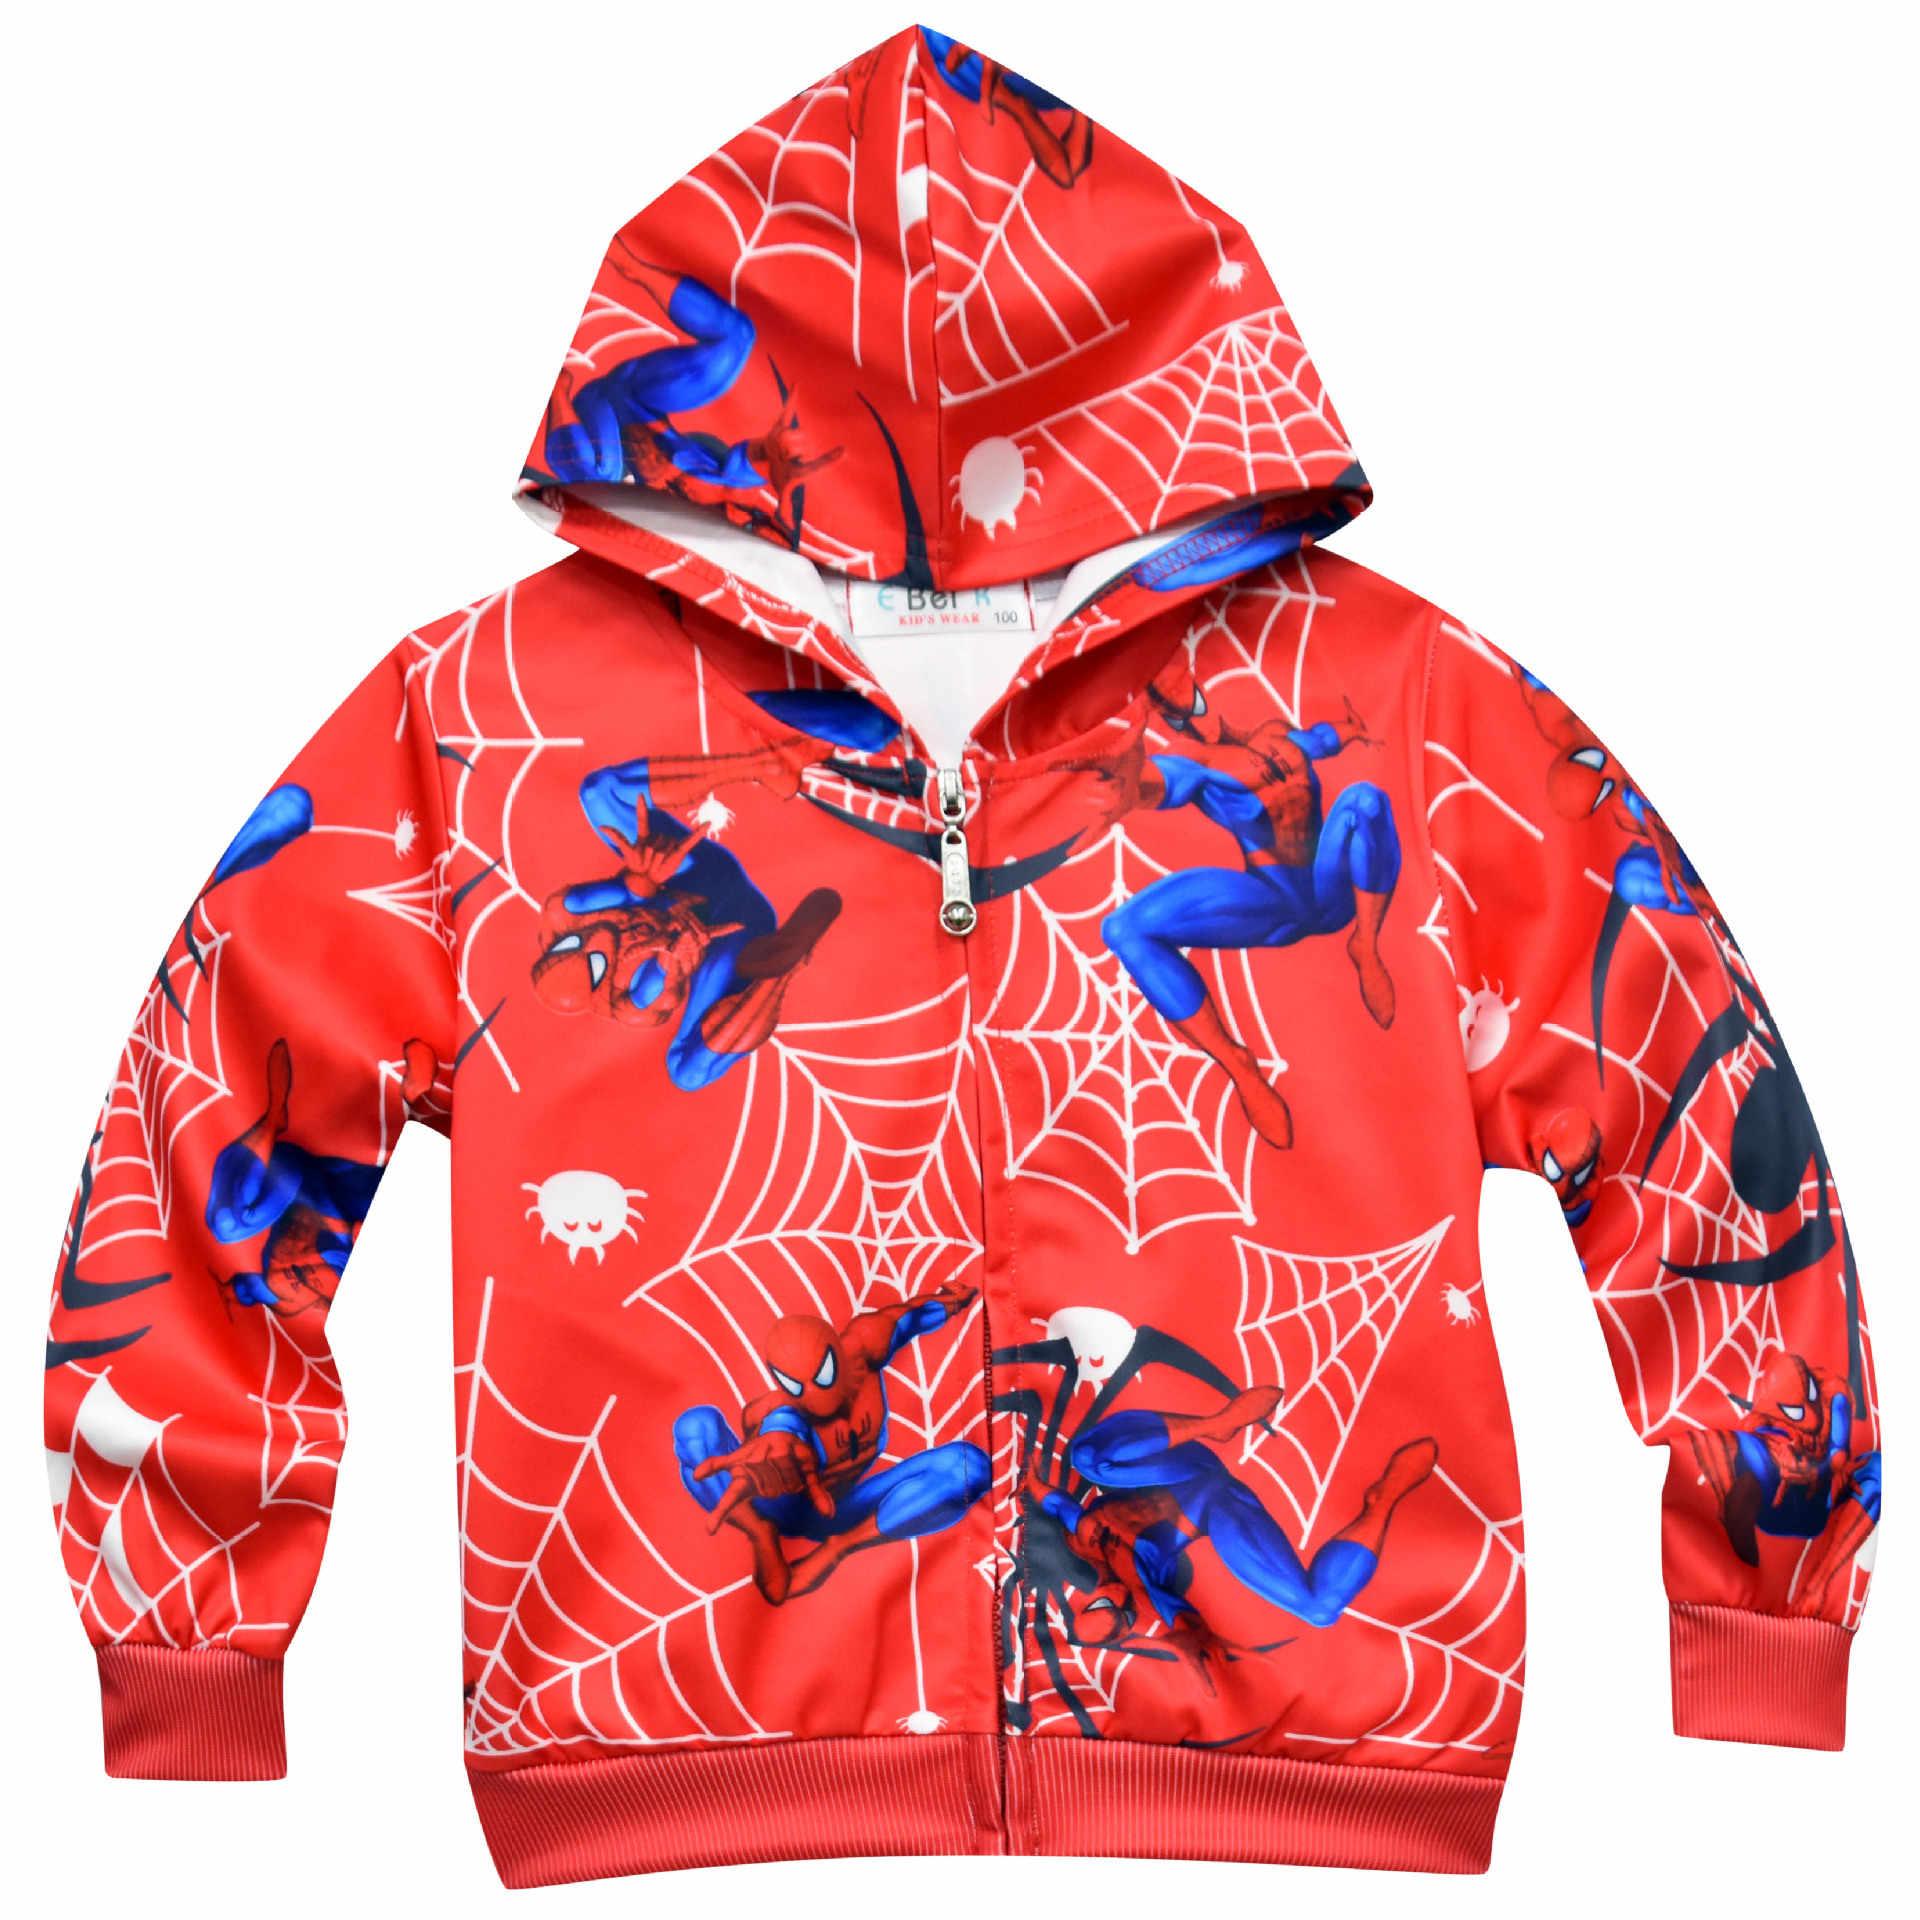 Neue 2020 Frühling Jacke Herbst Jungen Mantel Jacken Mode Jungen Spiderman Mäntel Kinder Super Hero Jacken Oberbekleidung Jungen Kleidung Jacken Mäntel Aliexpress